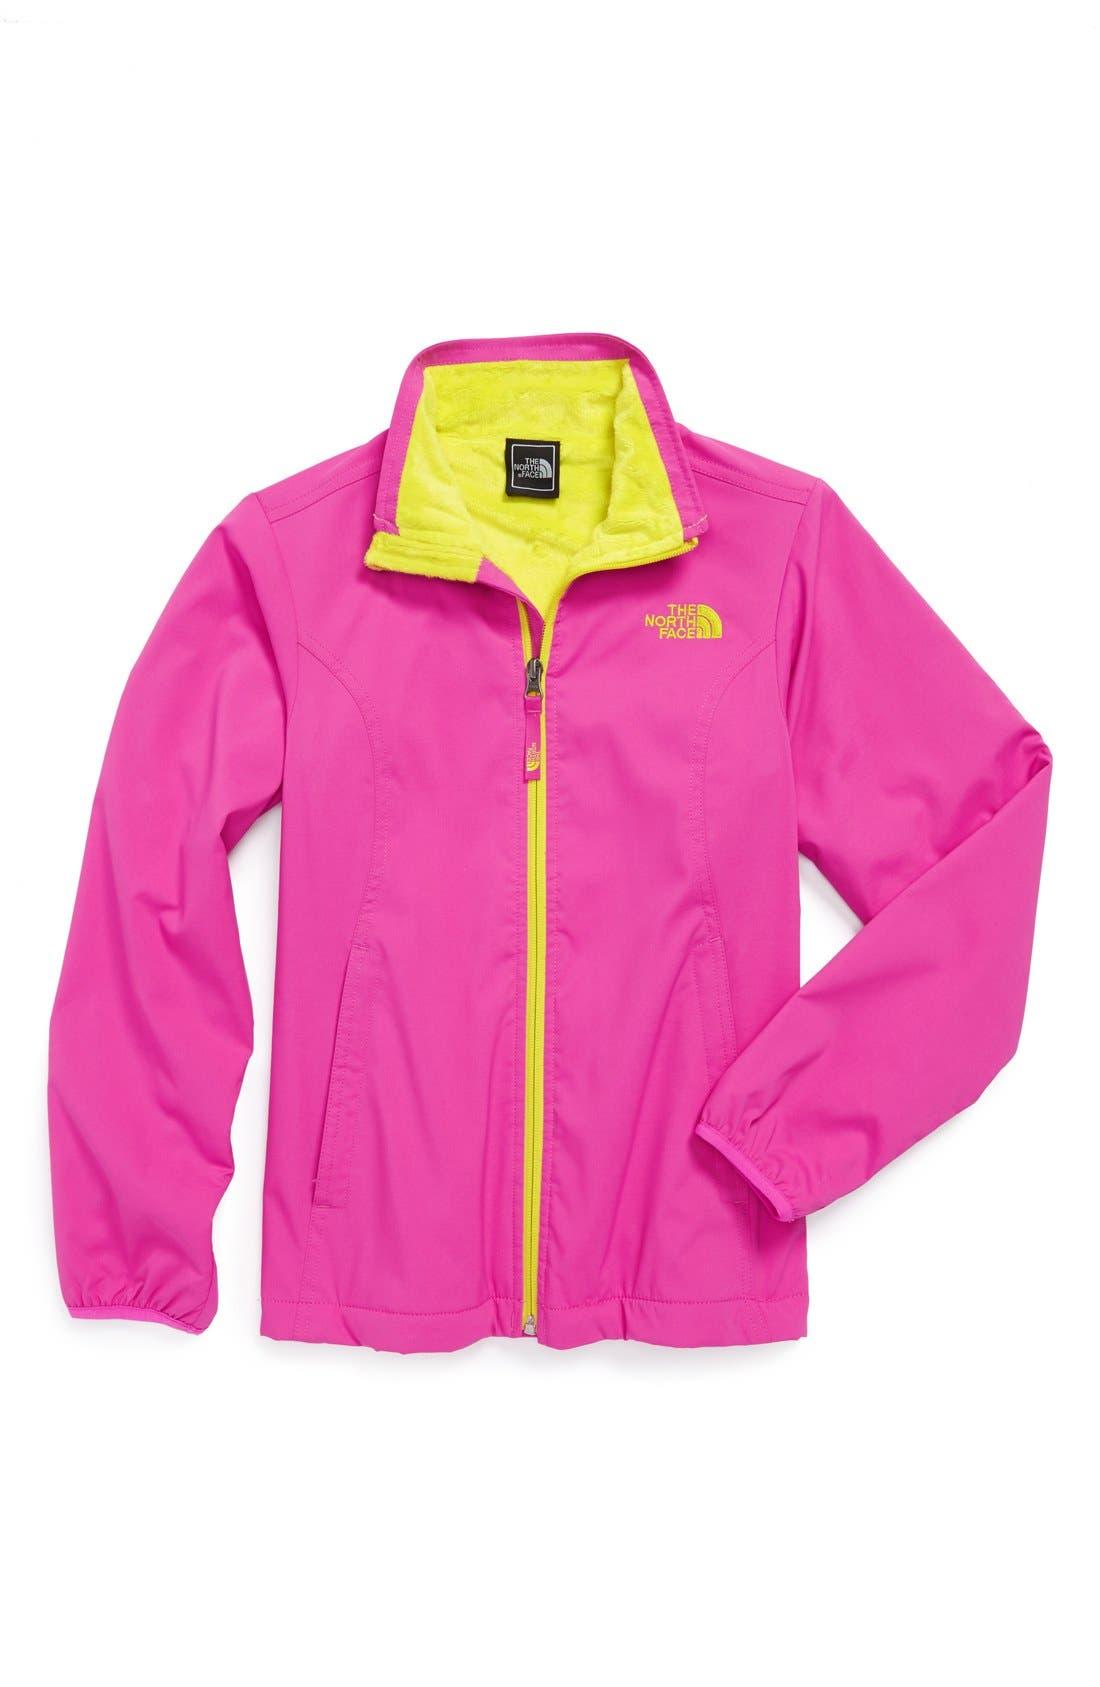 Main Image - The North Face 'Mossbud' Jacket (Big Girls)